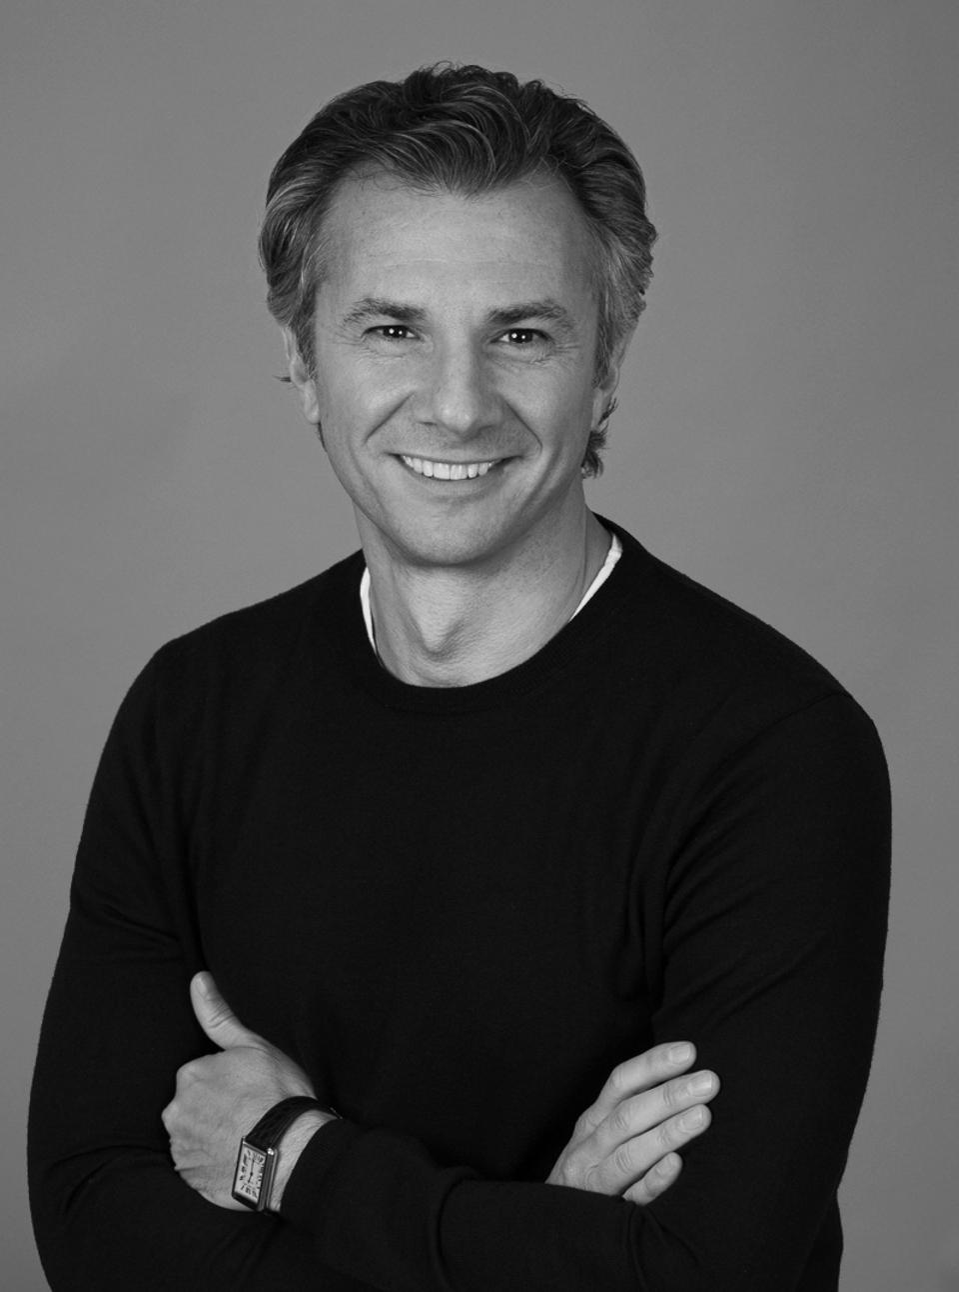 Diego Scotti, EVP and CMO